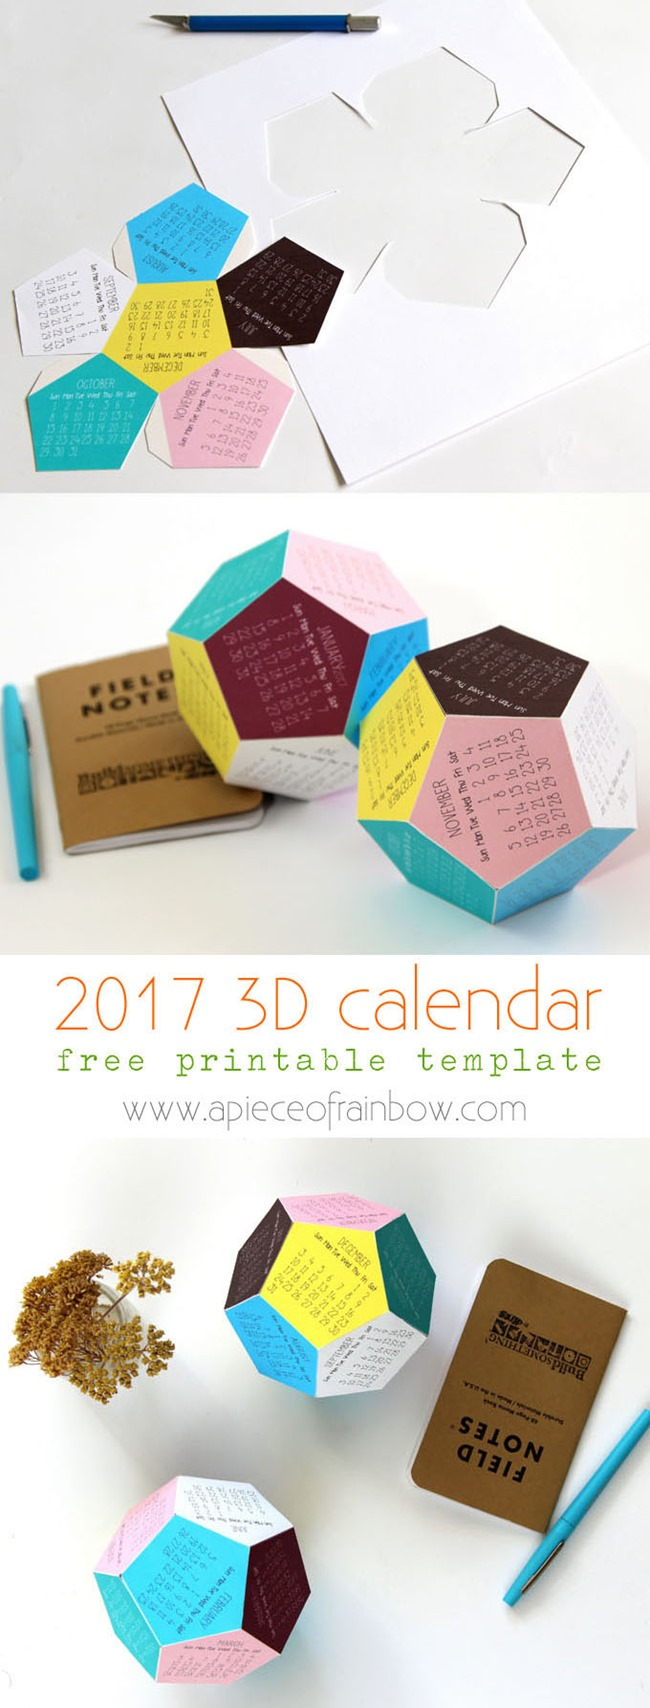 Free 2017 Printable Calendars - 3D